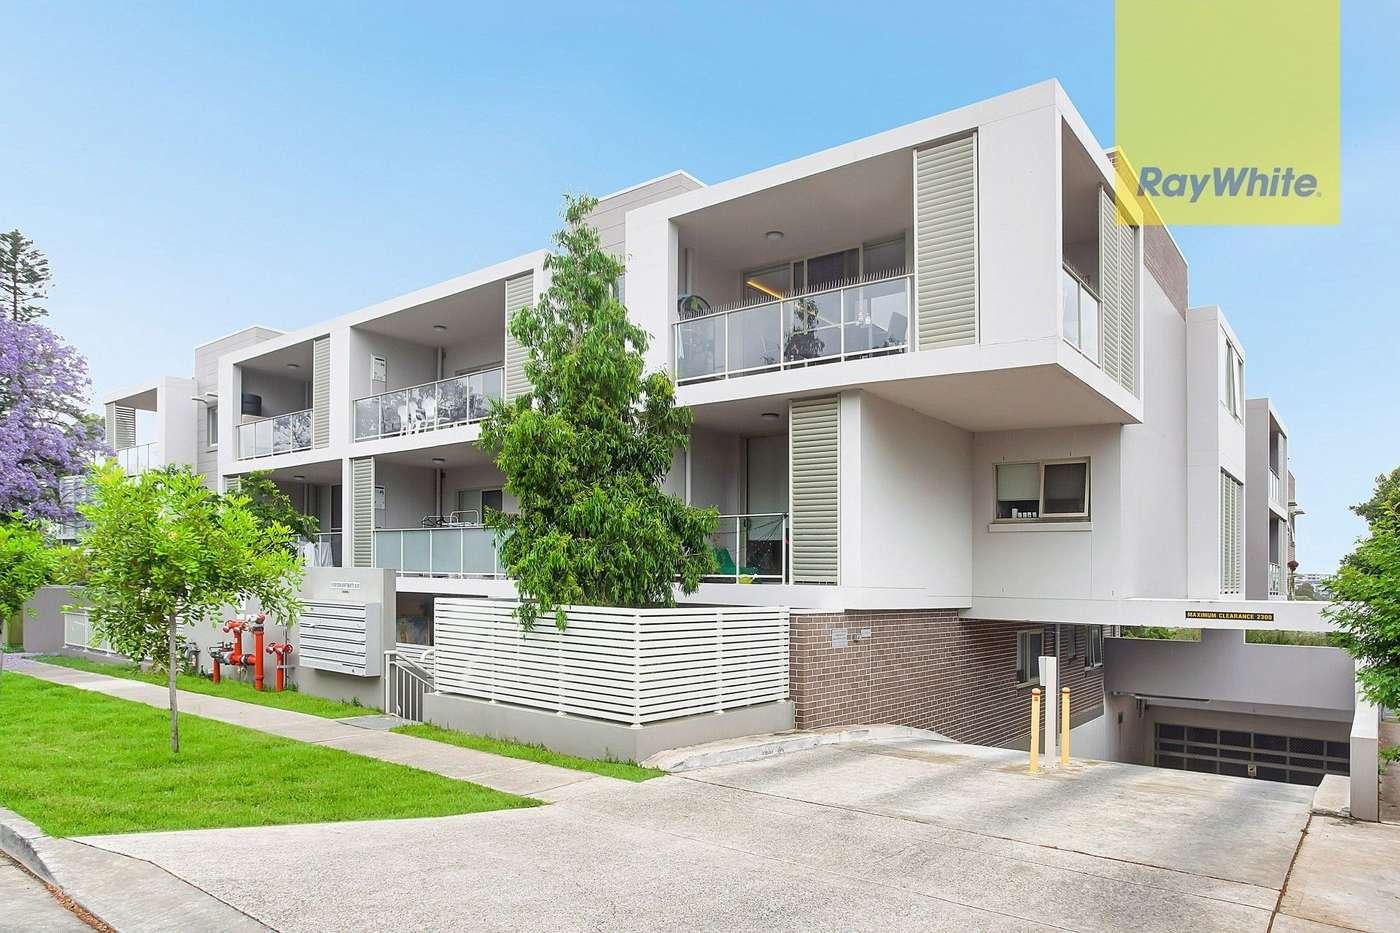 Main view of Homely unit listing, 7/93-95 Thomas Street, Parramatta, NSW 2150